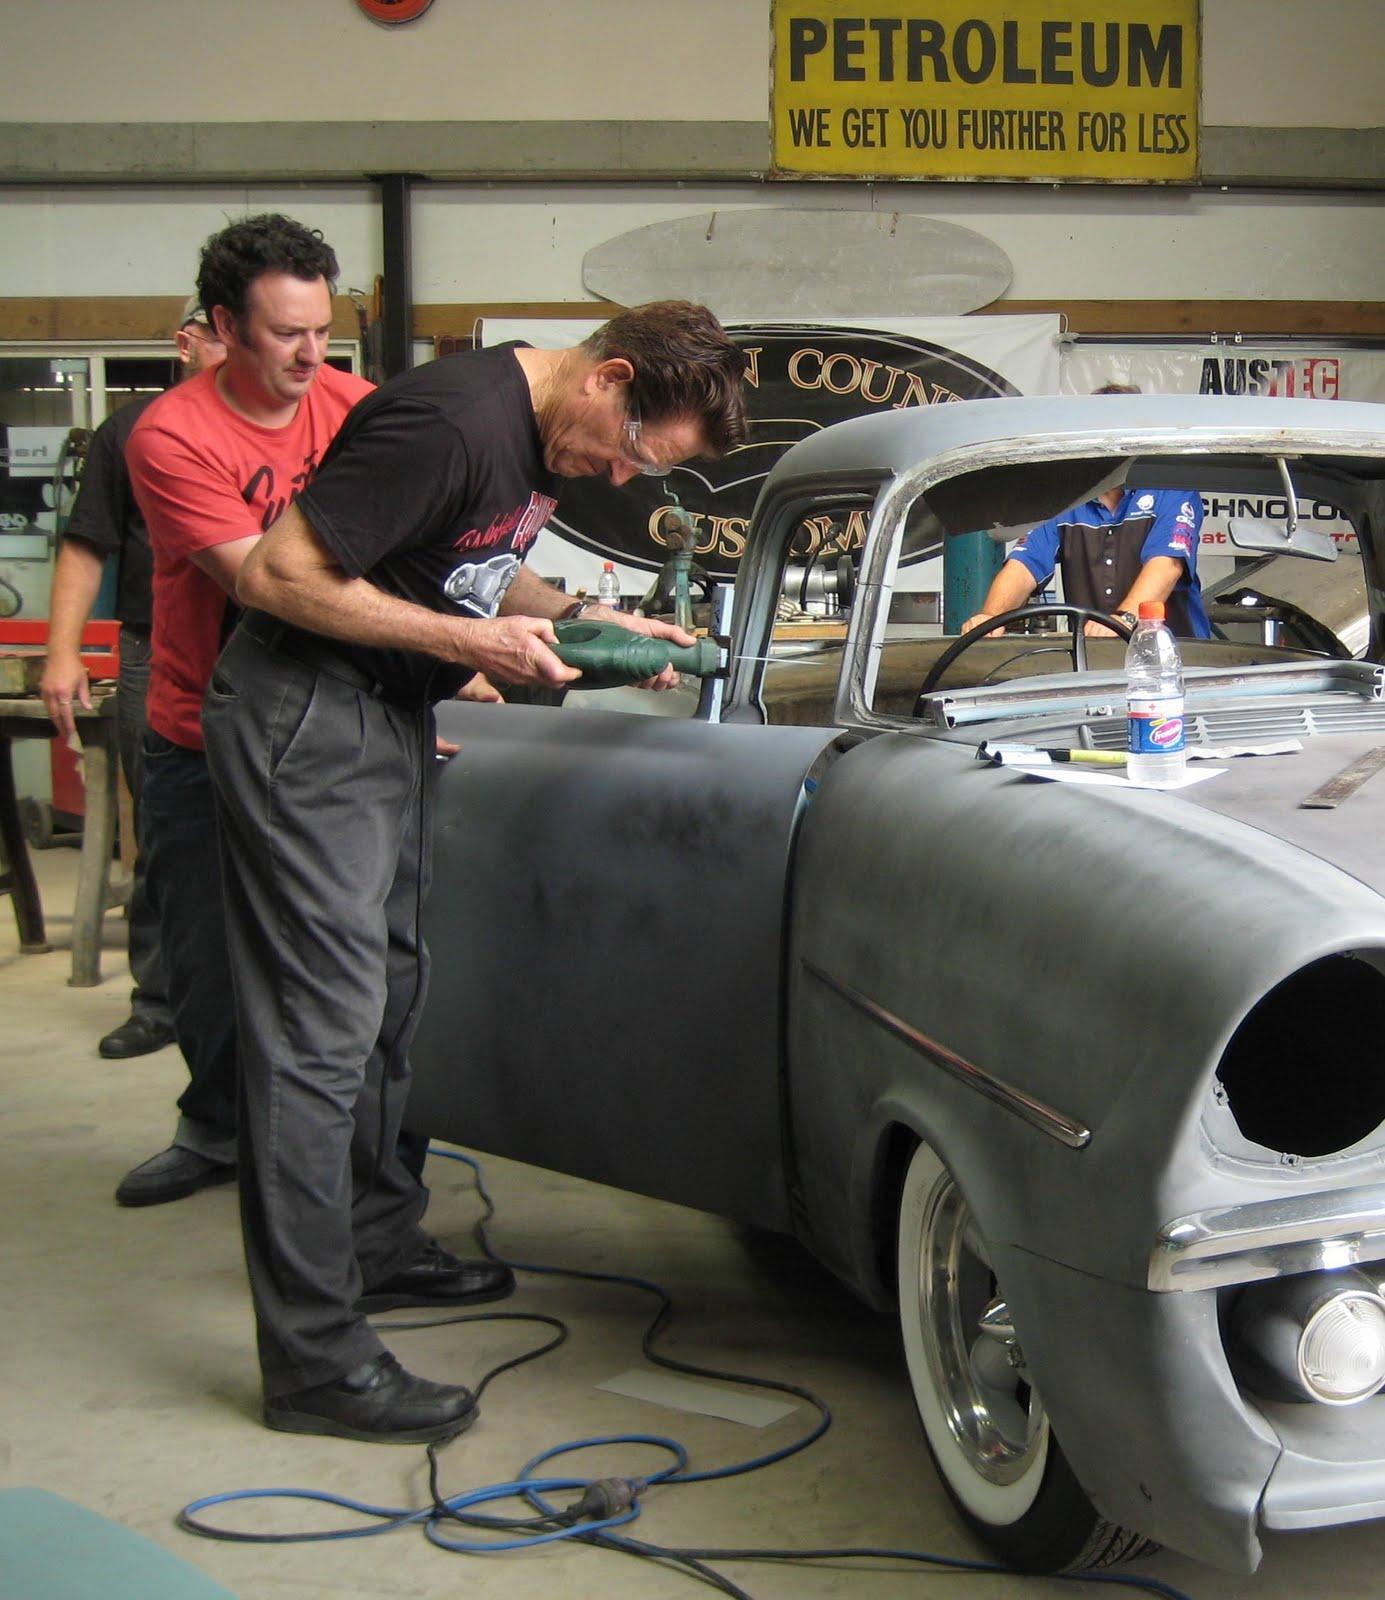 Aluminum Brass Working France: The Flipside: July 2010